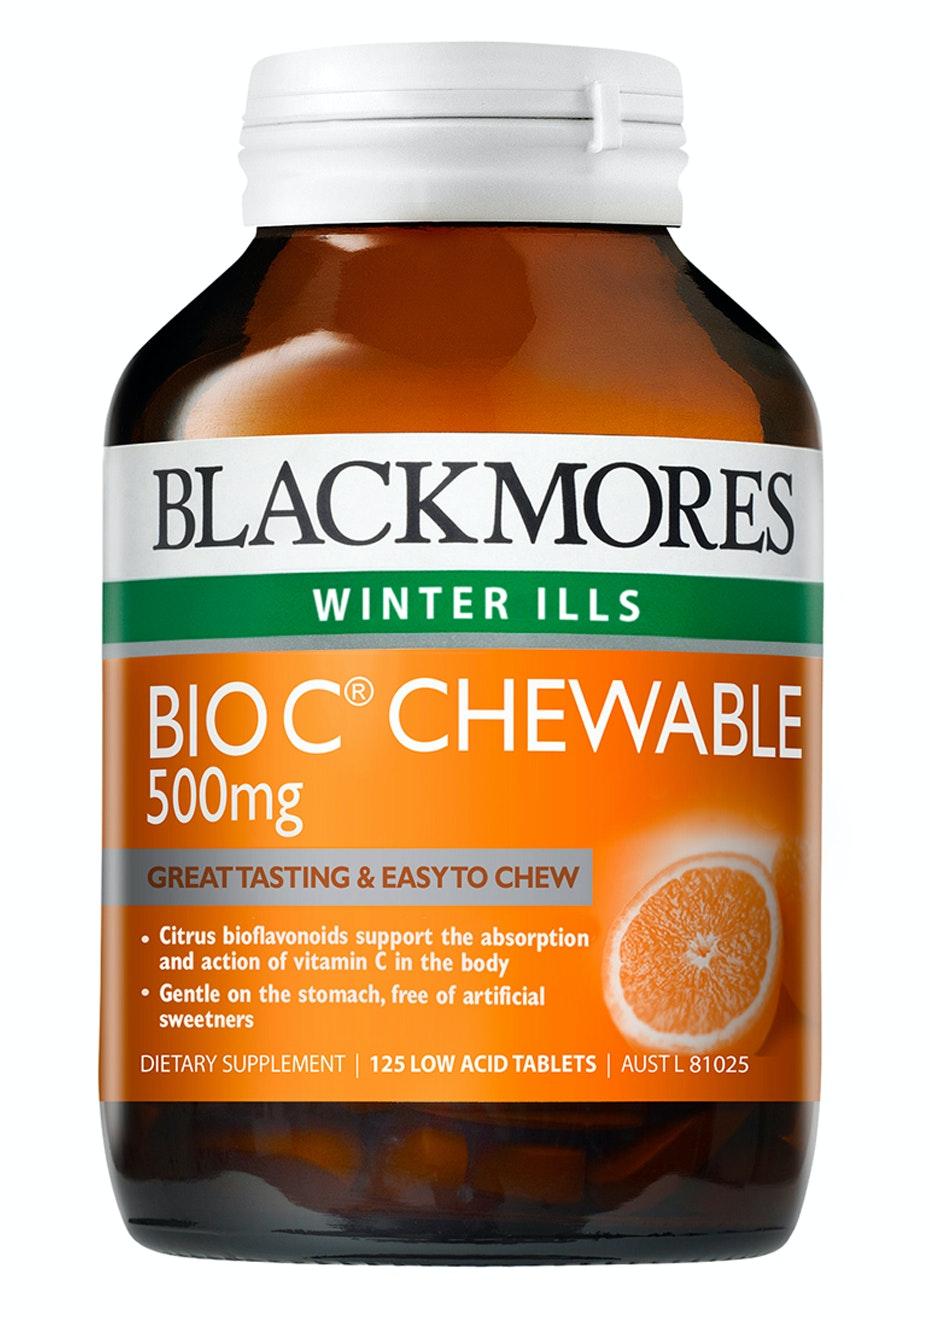 Bio C® Chewable 500mg Tabs